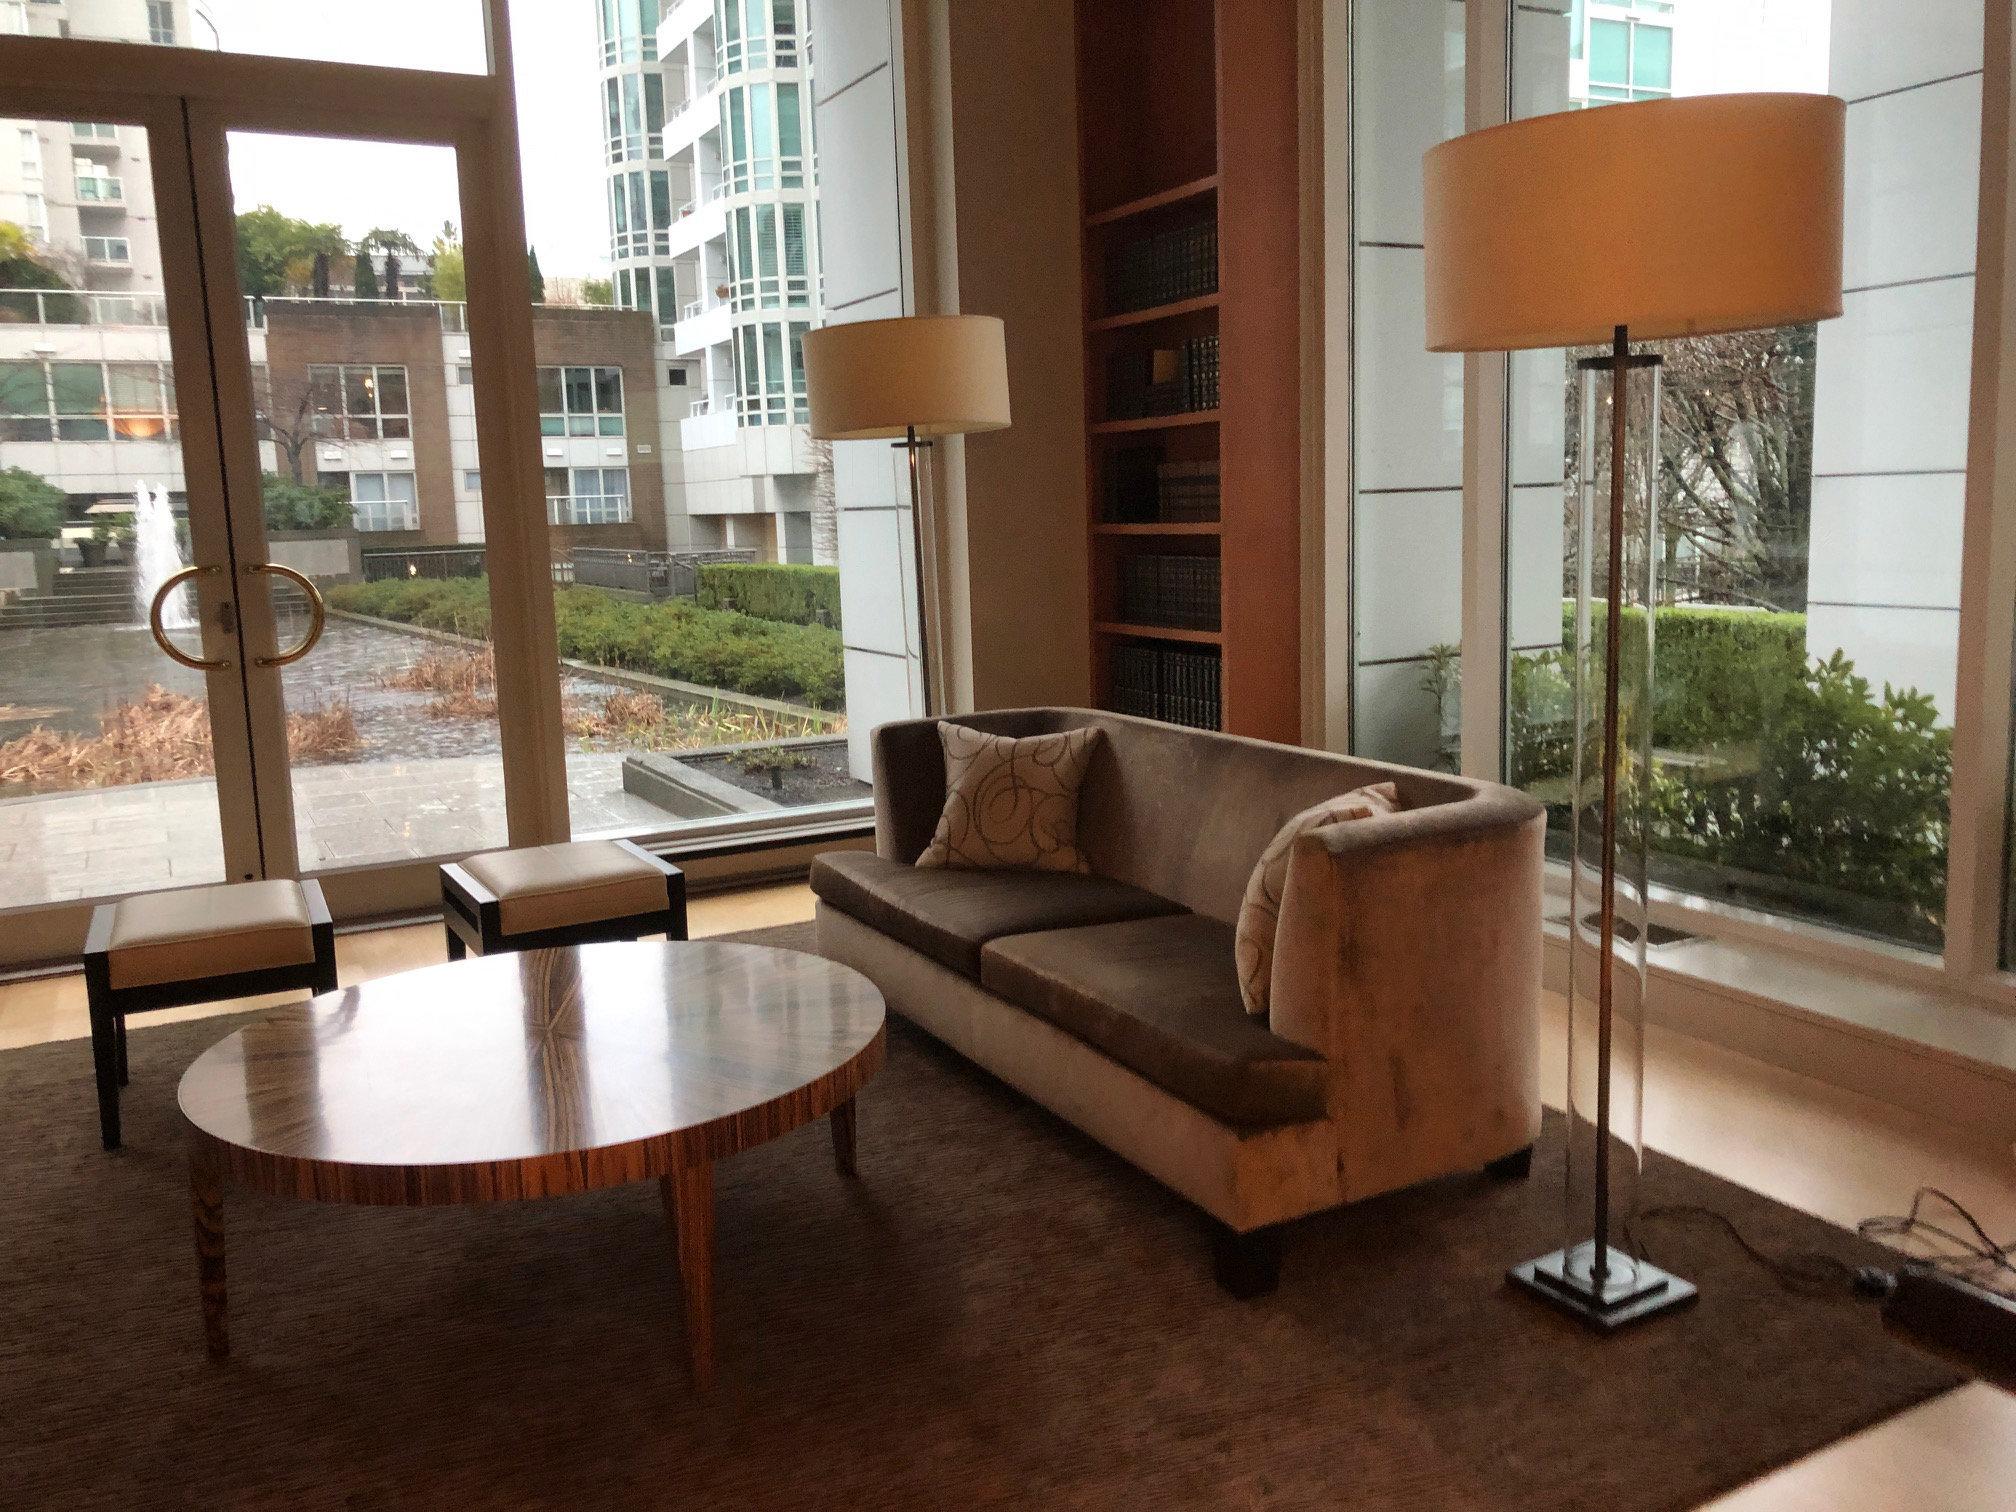 1500 Hornby Lounge!